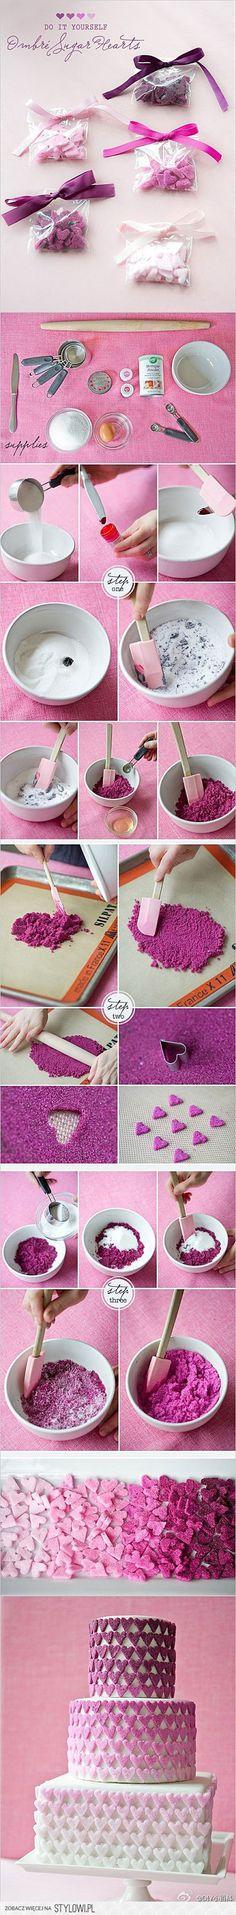 DIY sugar shapes